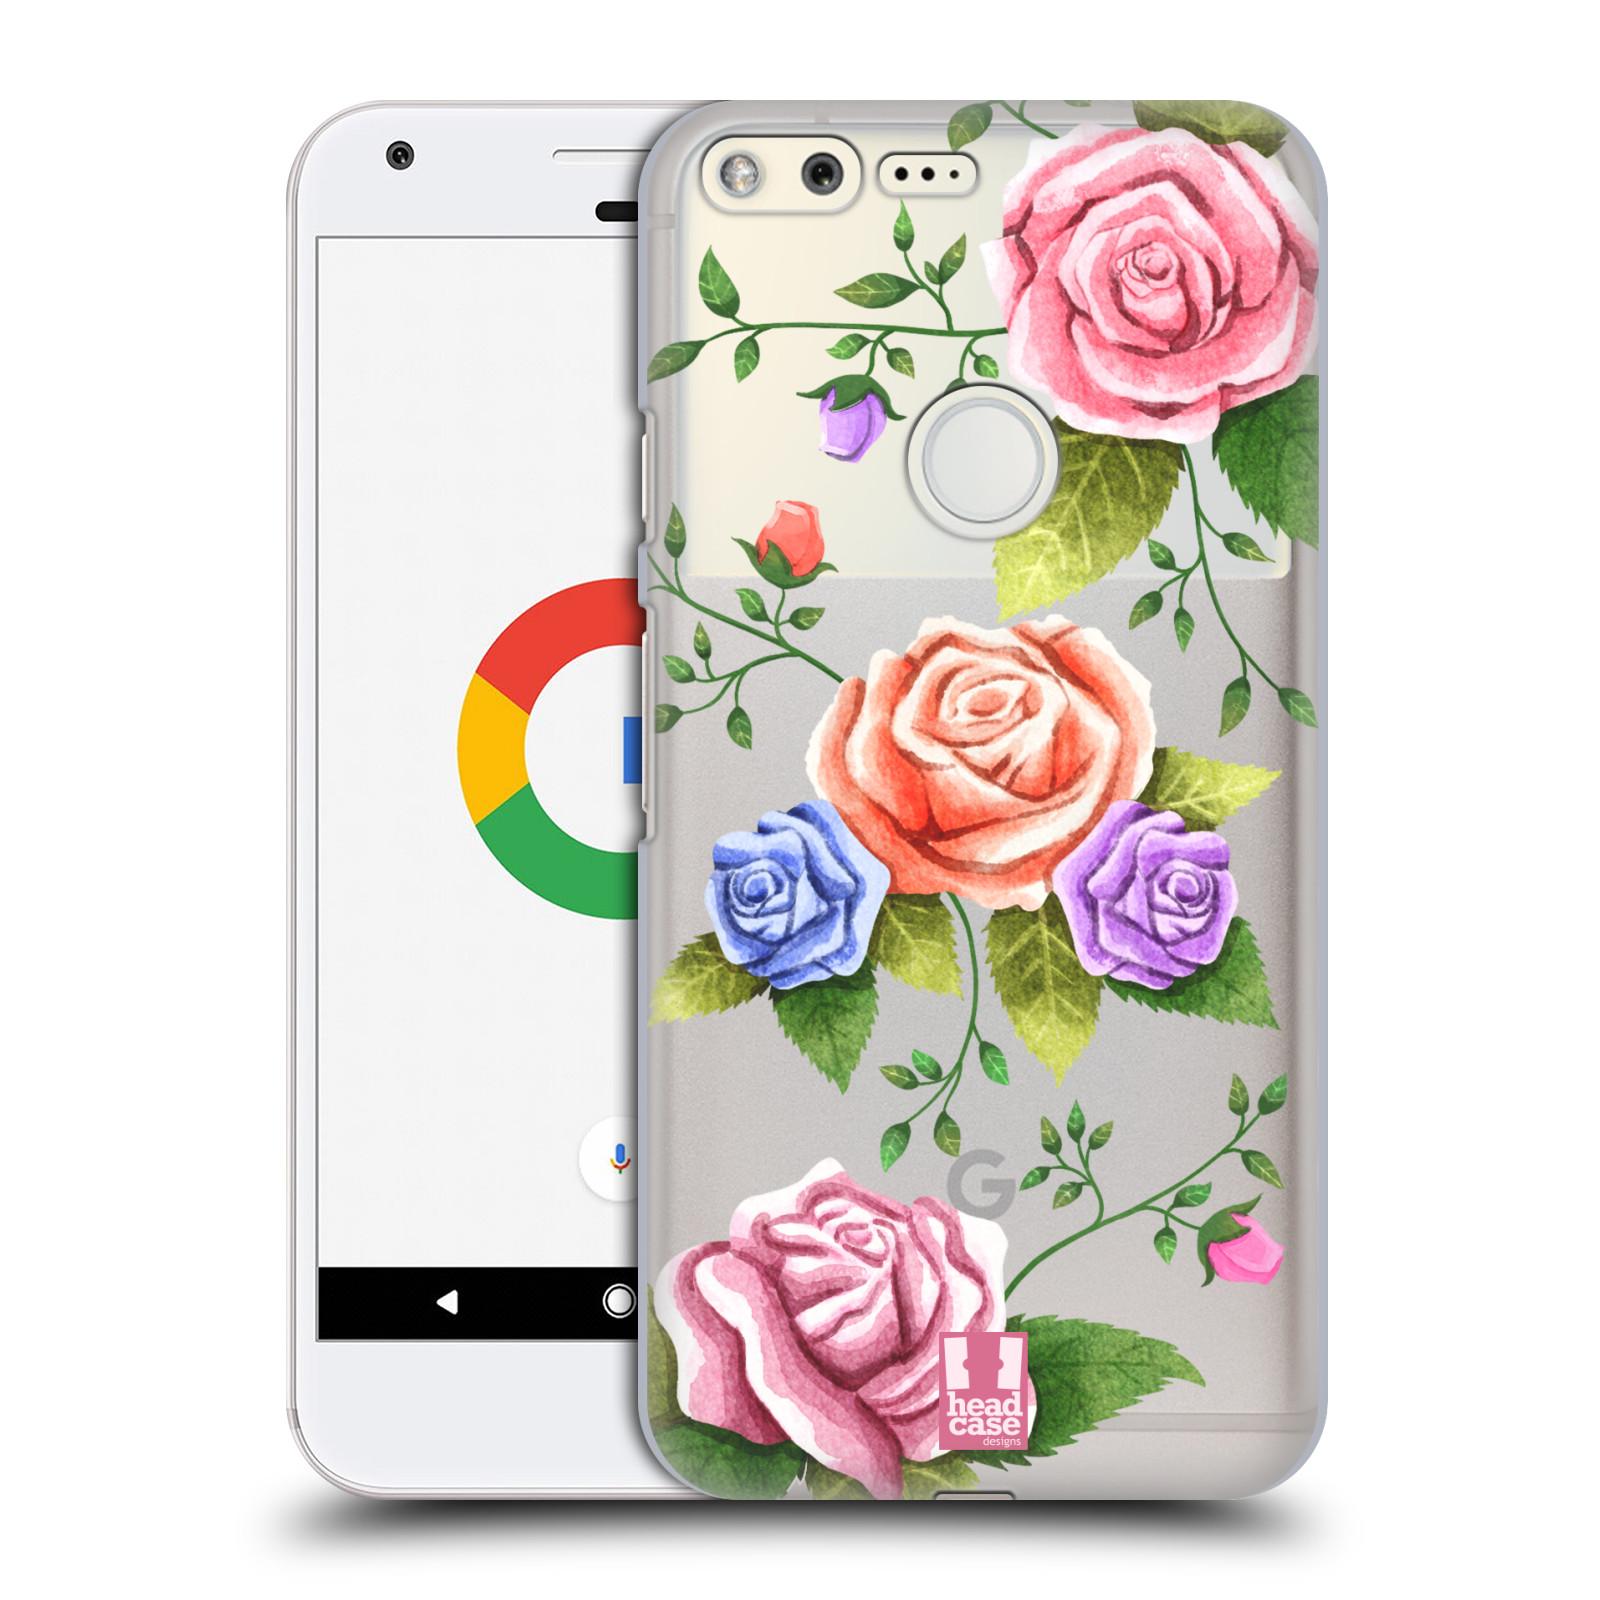 CASE-DESIGNS-organici-HEAD-stampe-floreali-2-HARD-BACK-CASE-per-telefoni-GOOGLE